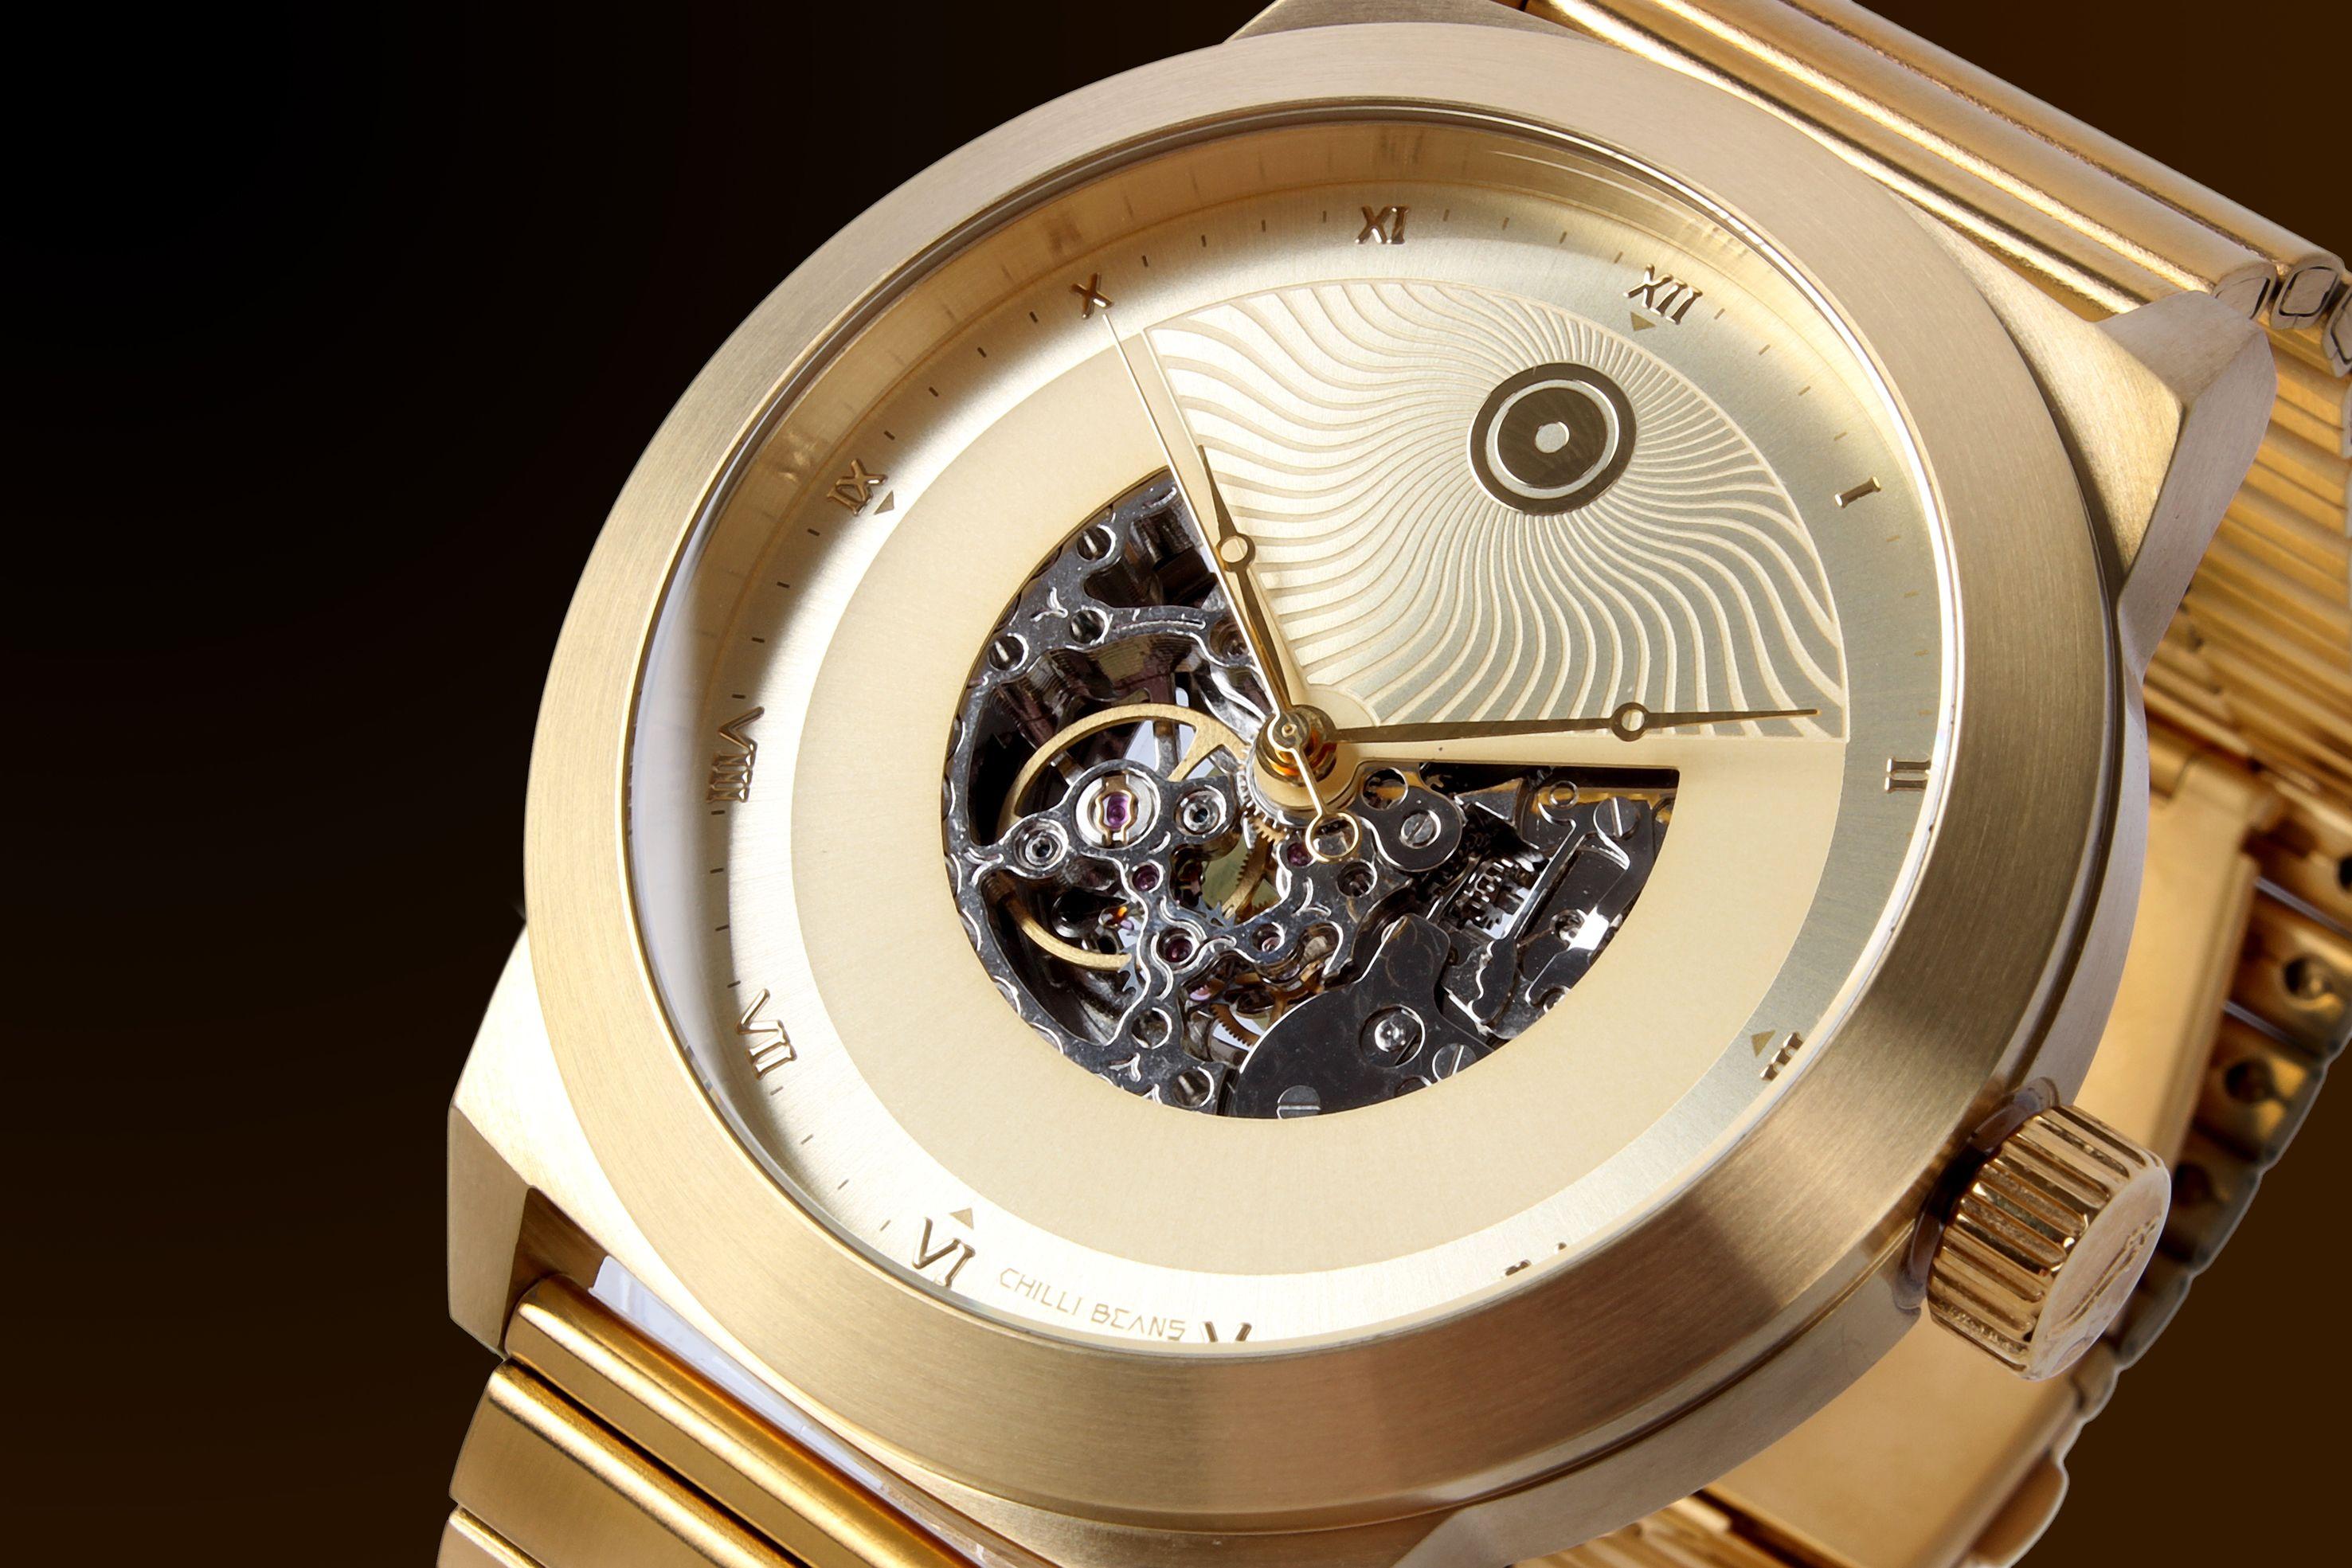 57864be63 Chilli Beans lança relógio inspirado no Sol. | My stylo | Relogio ...